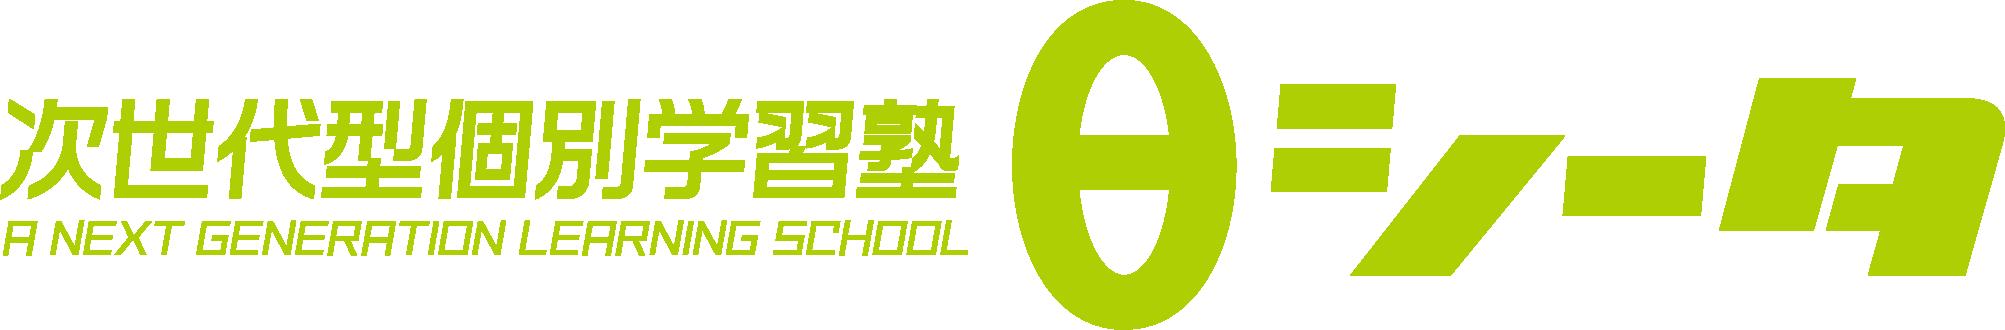 次世代型個別学習塾シータ